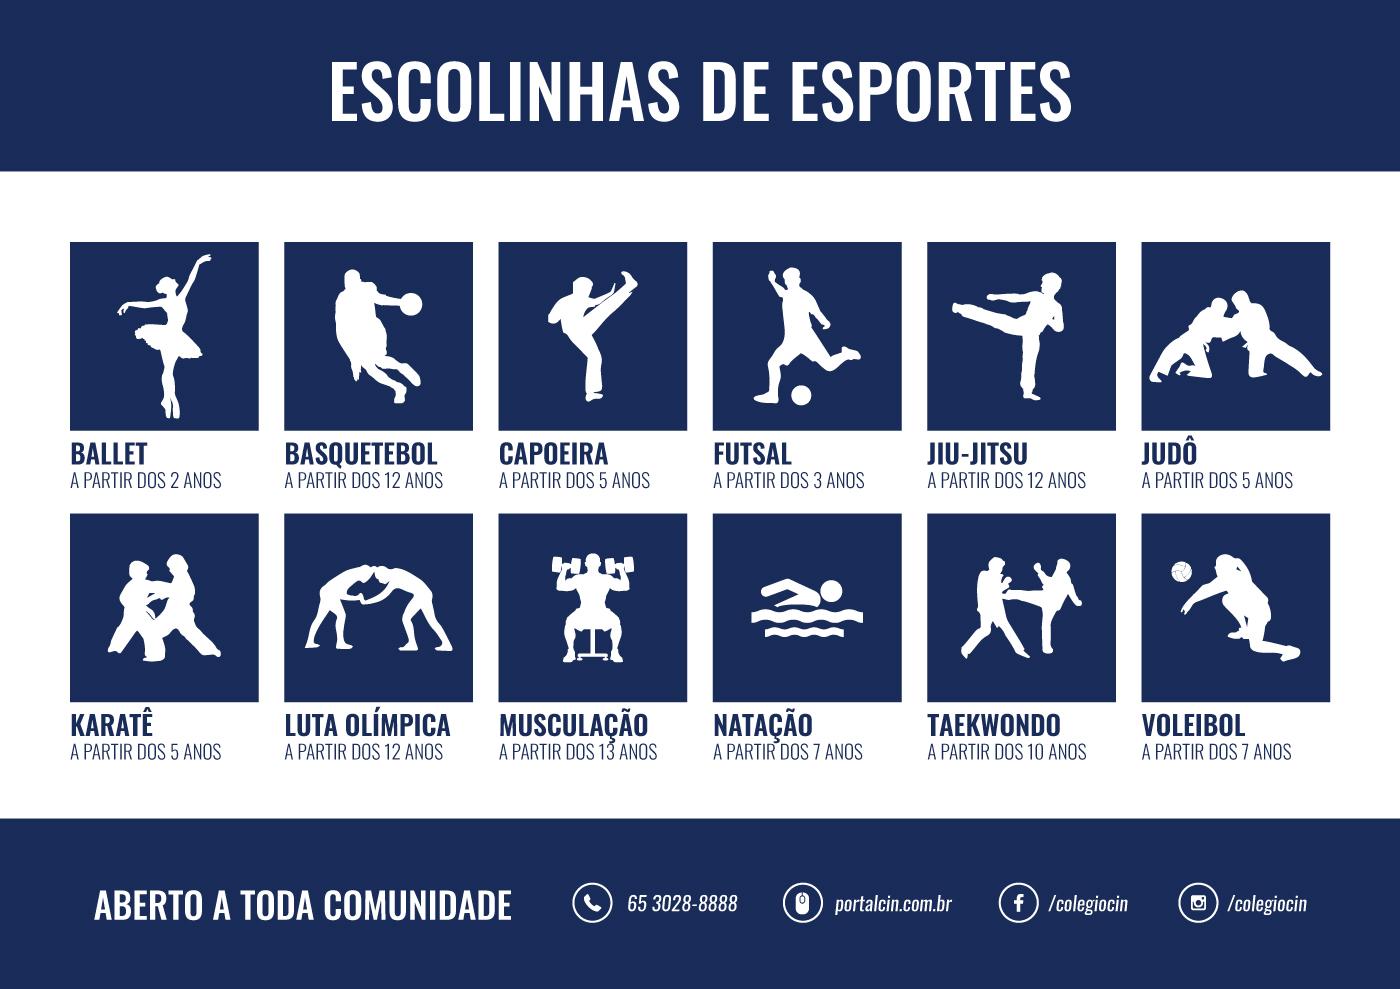 Esporte